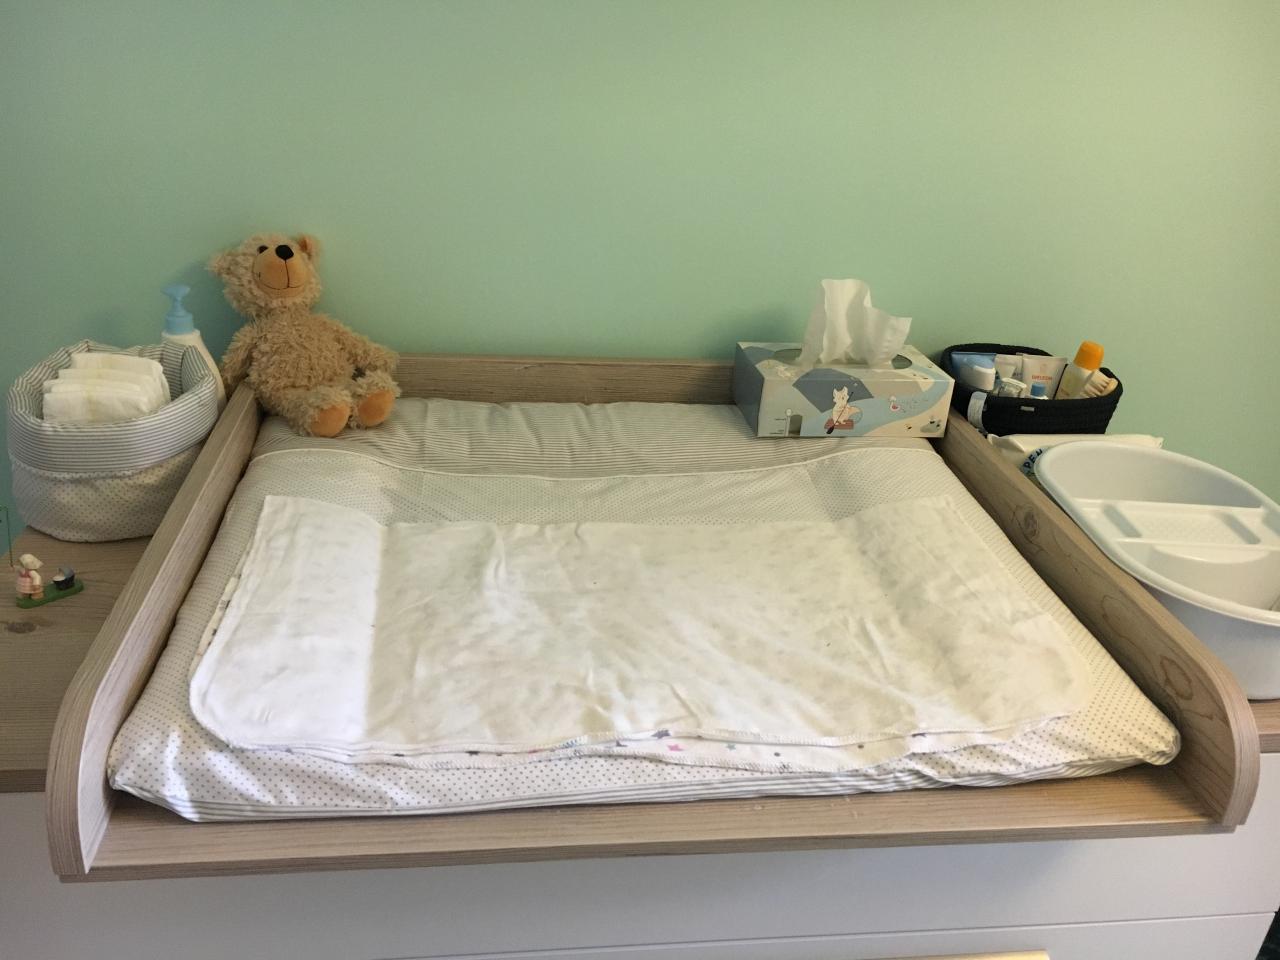 Wickelorganizer Fur Paidi Kommode Forum Baby Vorbereitung Urbia De